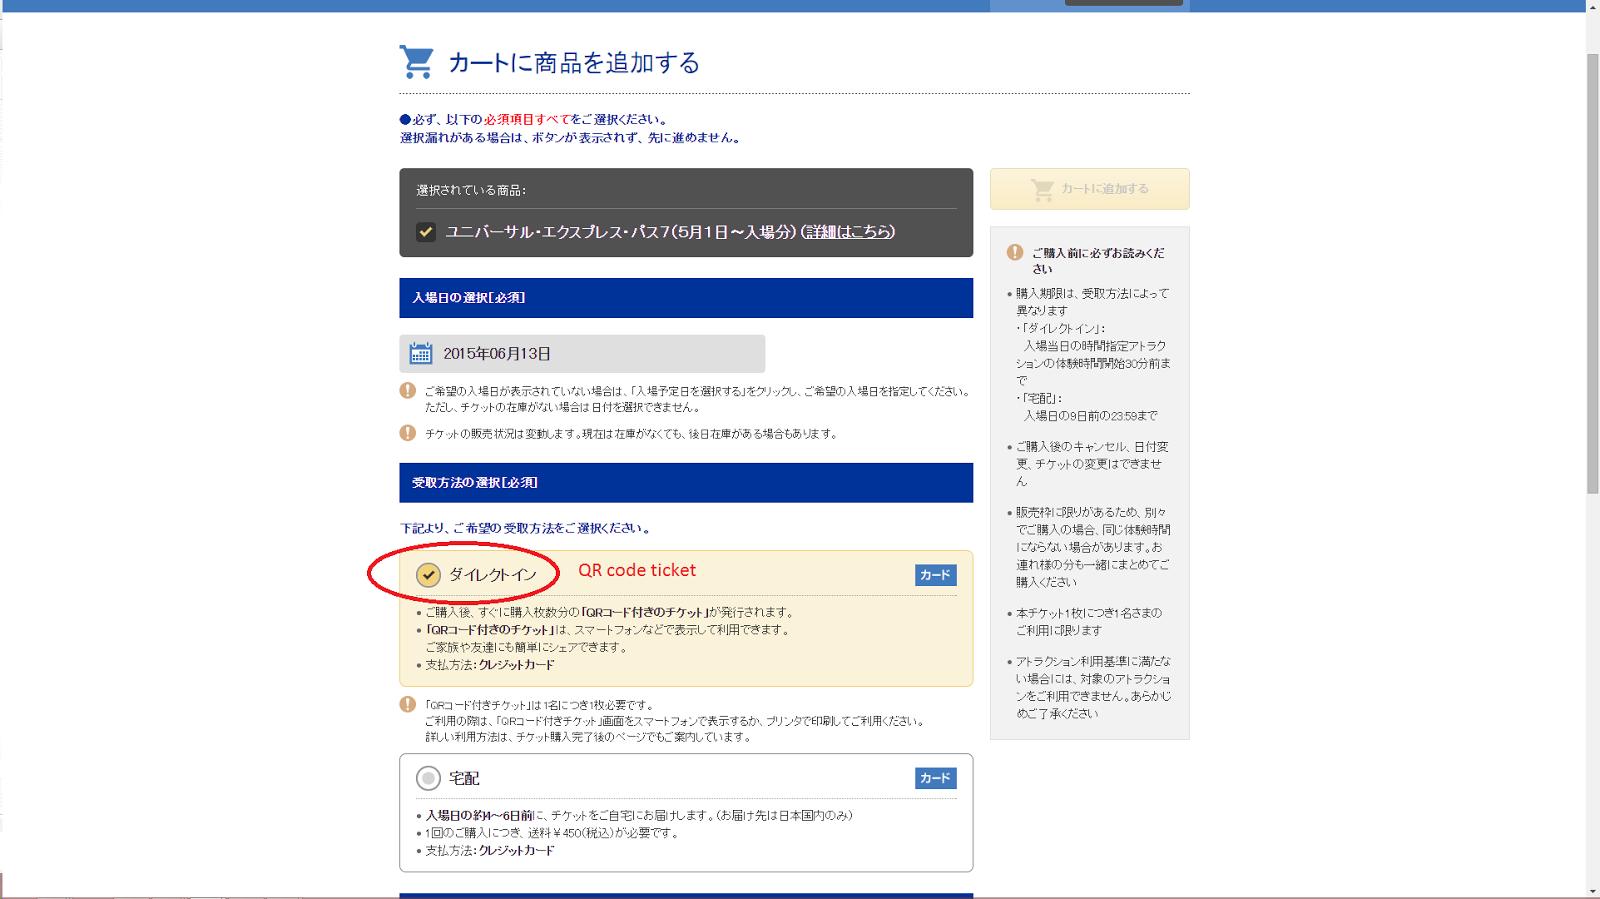 Donde La Oferta Me Lleve How To Buy USJ Universal Studios Japan - Us zip code alphanumeric